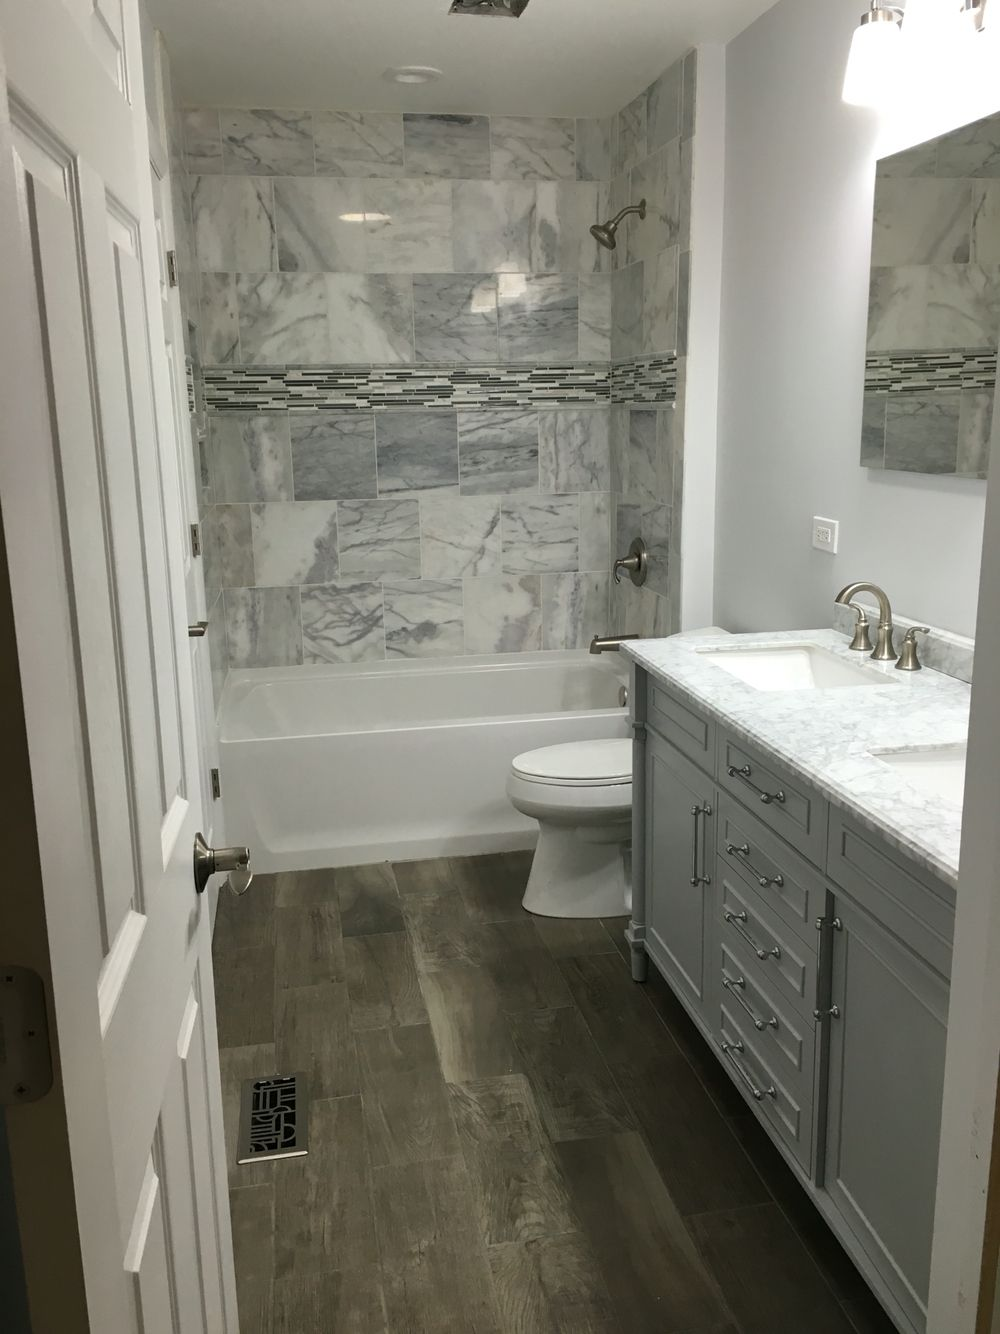 Bathroom Remodel!   bath works   Pinterest   Bath, House ...